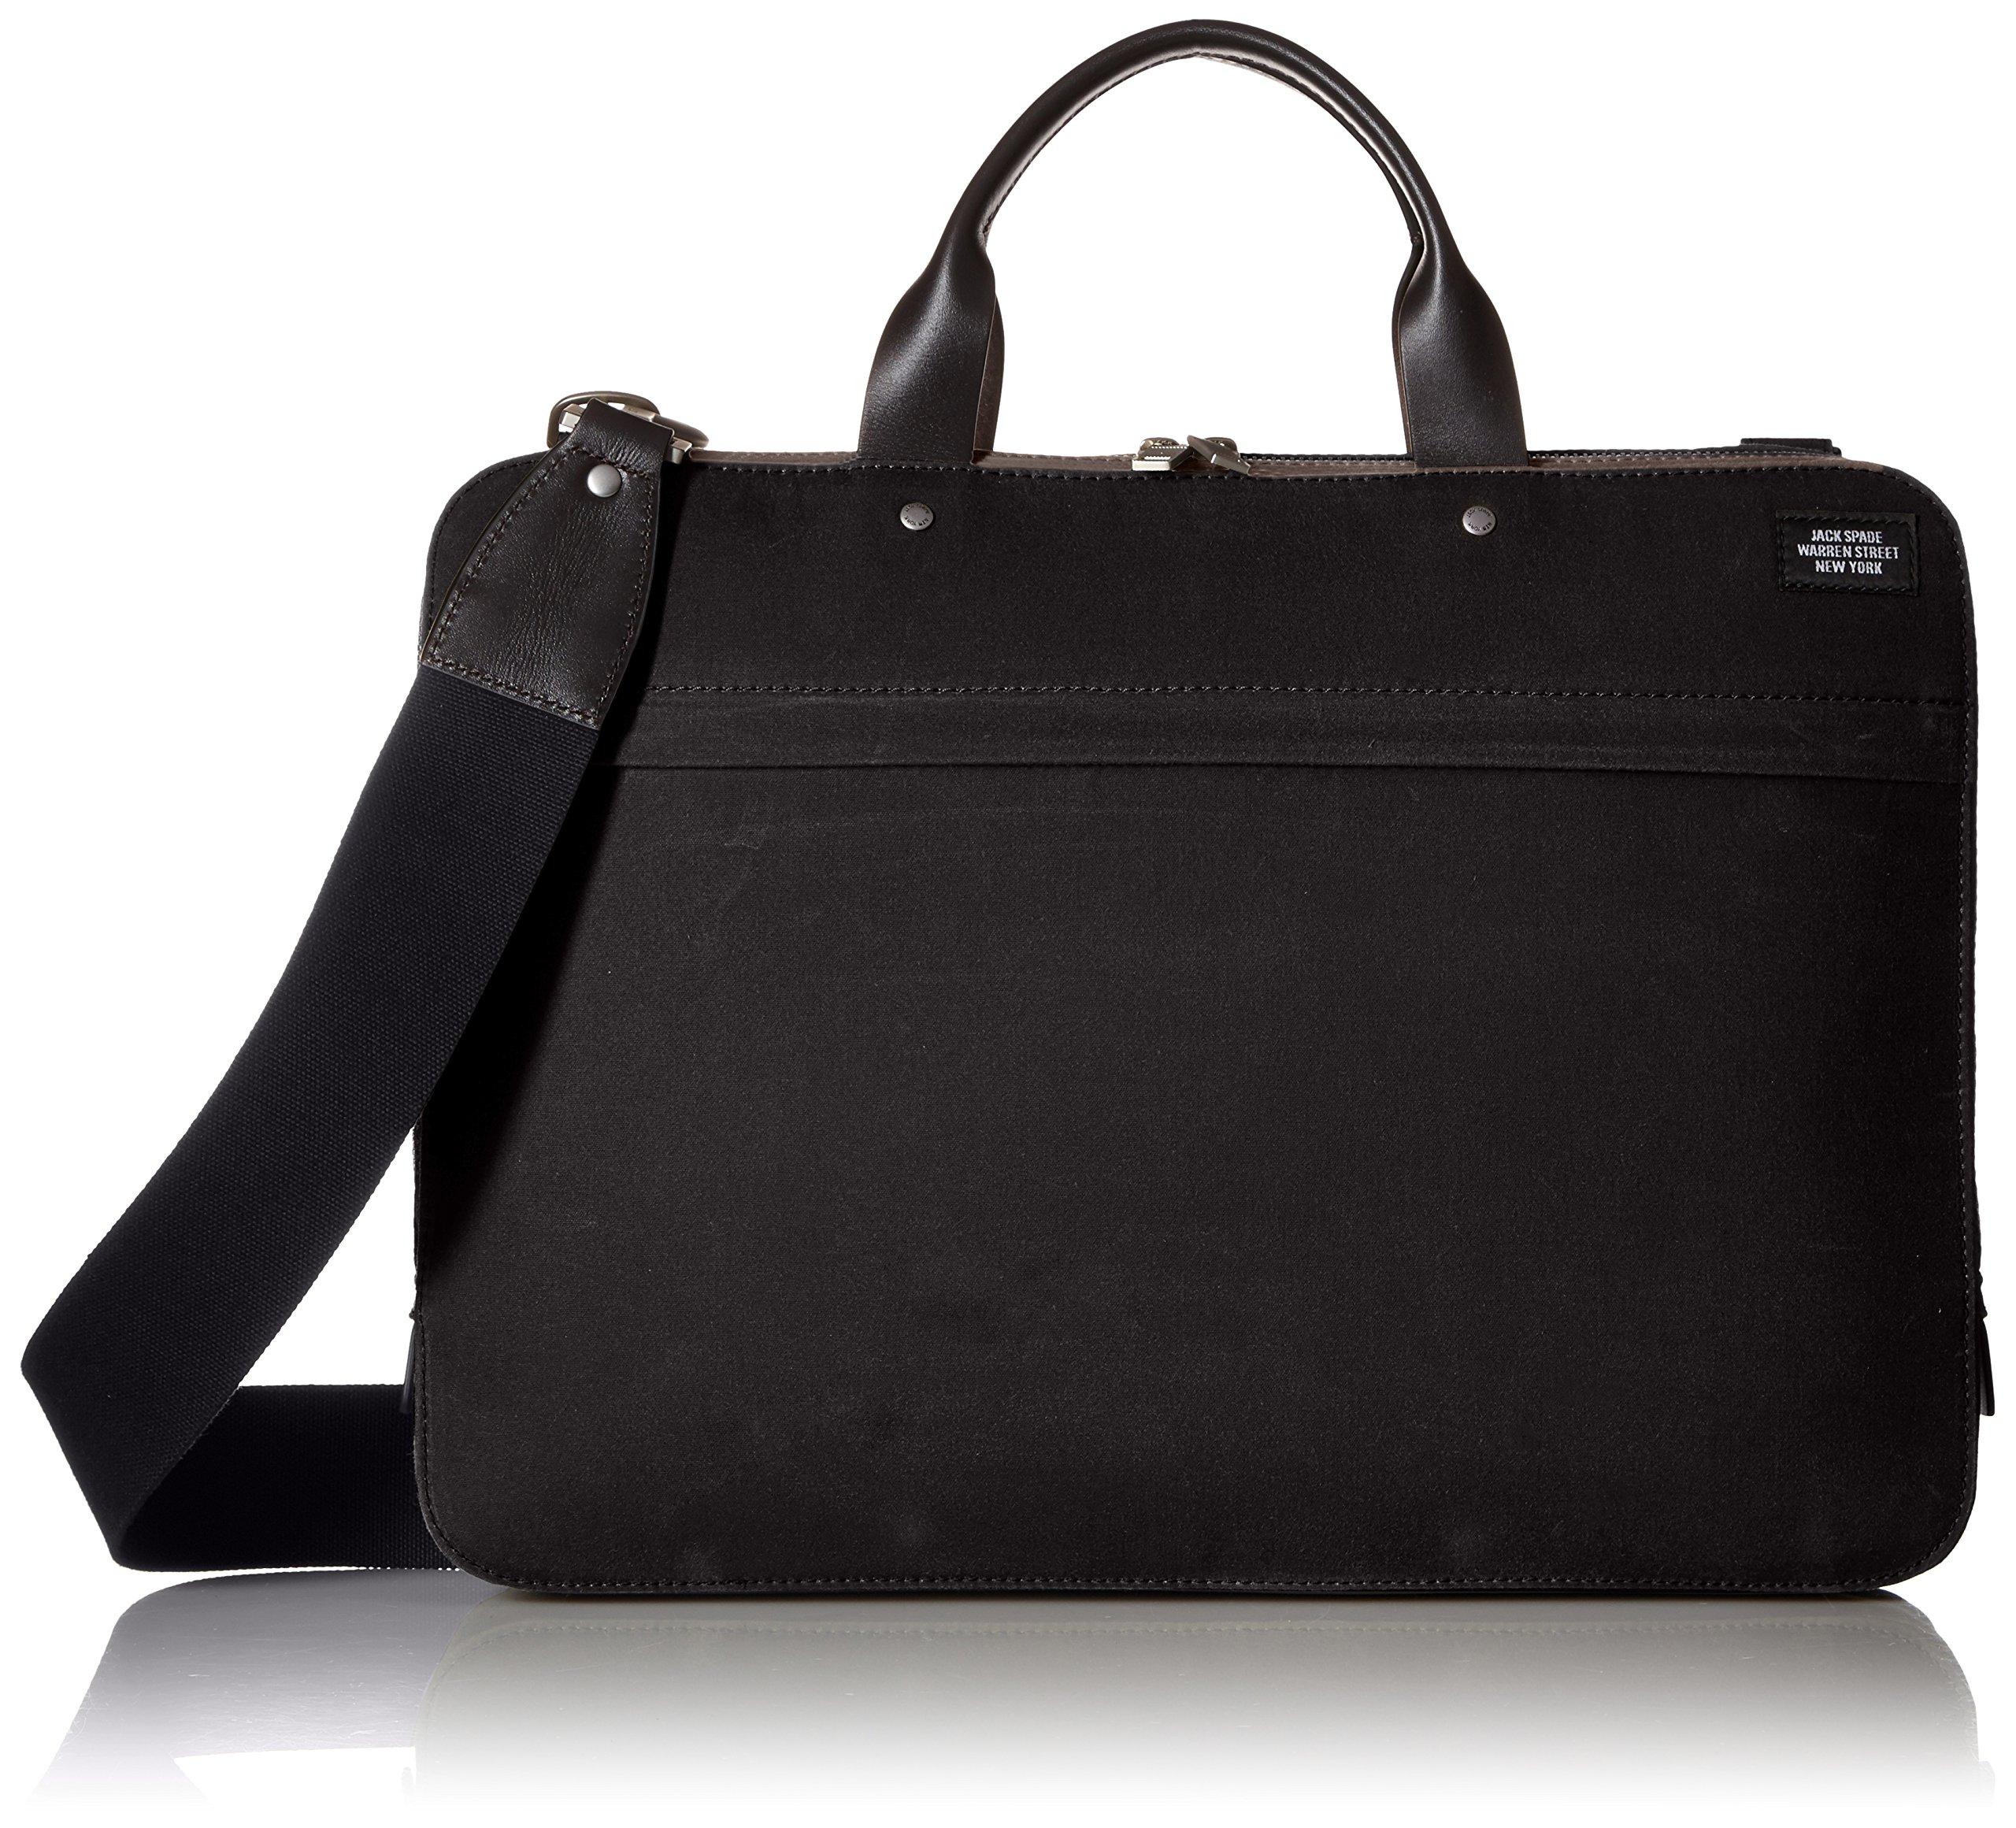 Jack Spade Waxwear Slim Briefcase,Chocolate,One Size